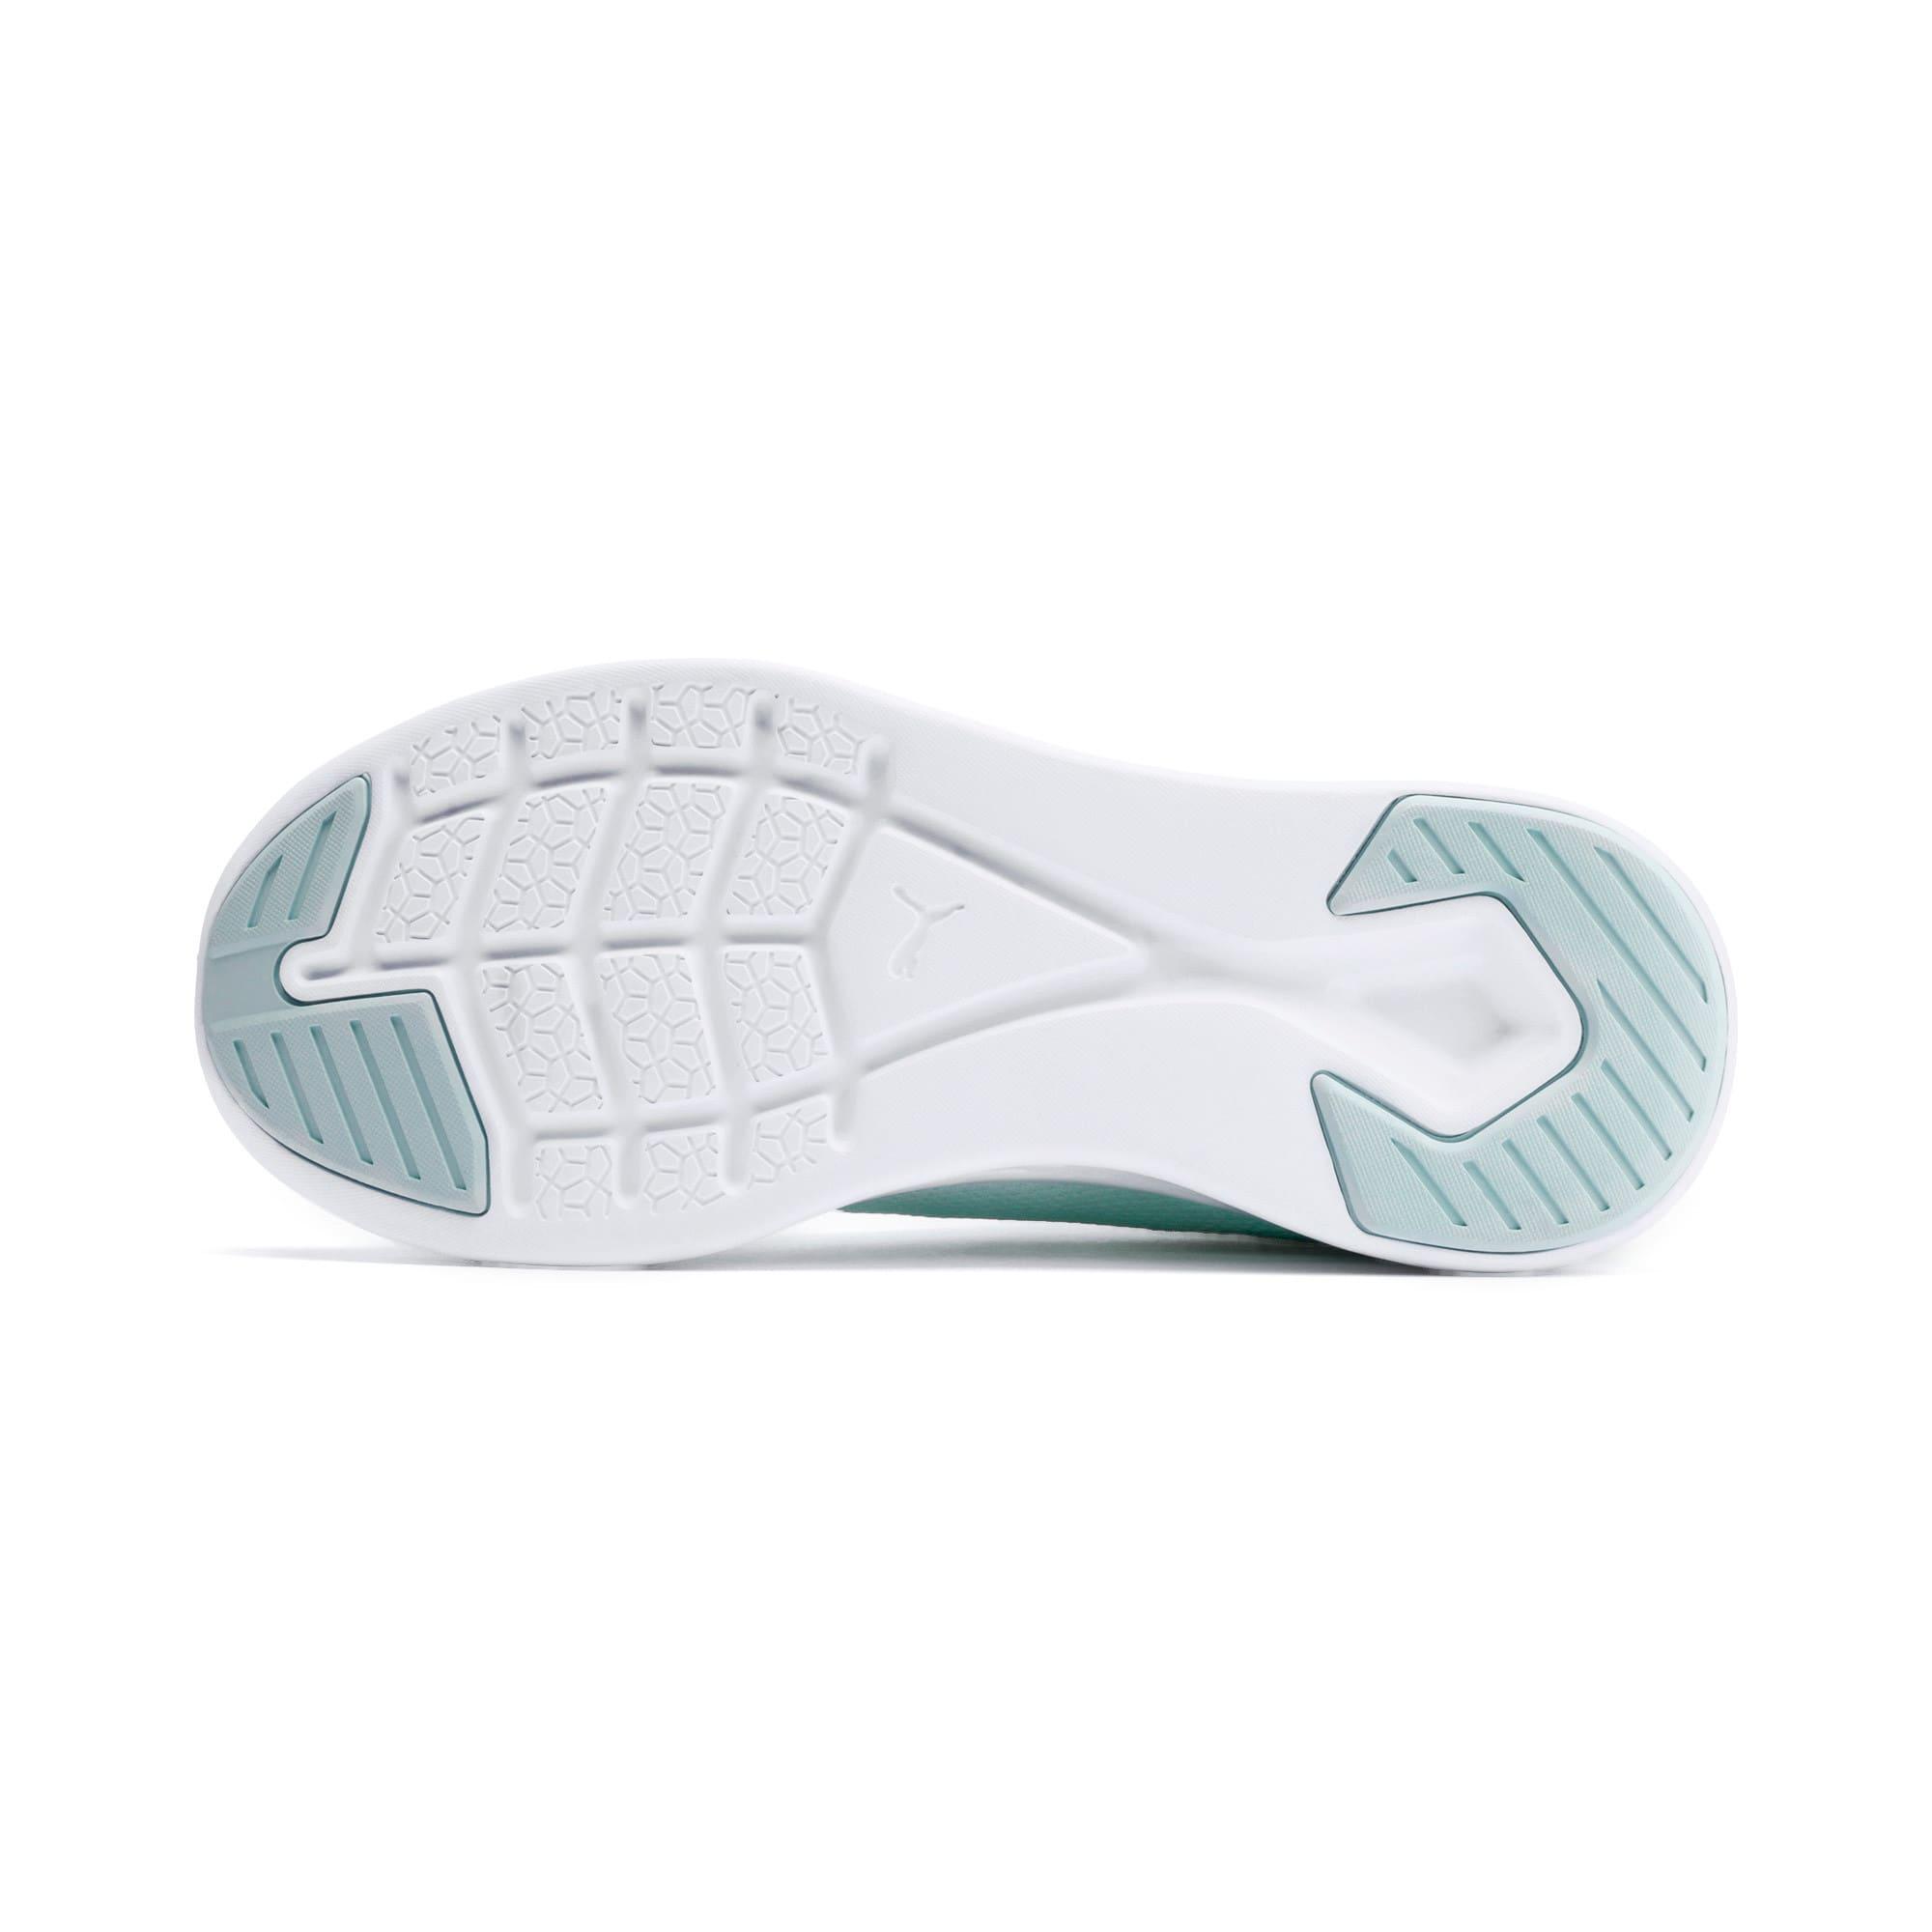 Thumbnail 4 of IGNITE Flash evoKNIT Women's Running Shoes, Fair Aqua-Blazing Yellow, medium-IND